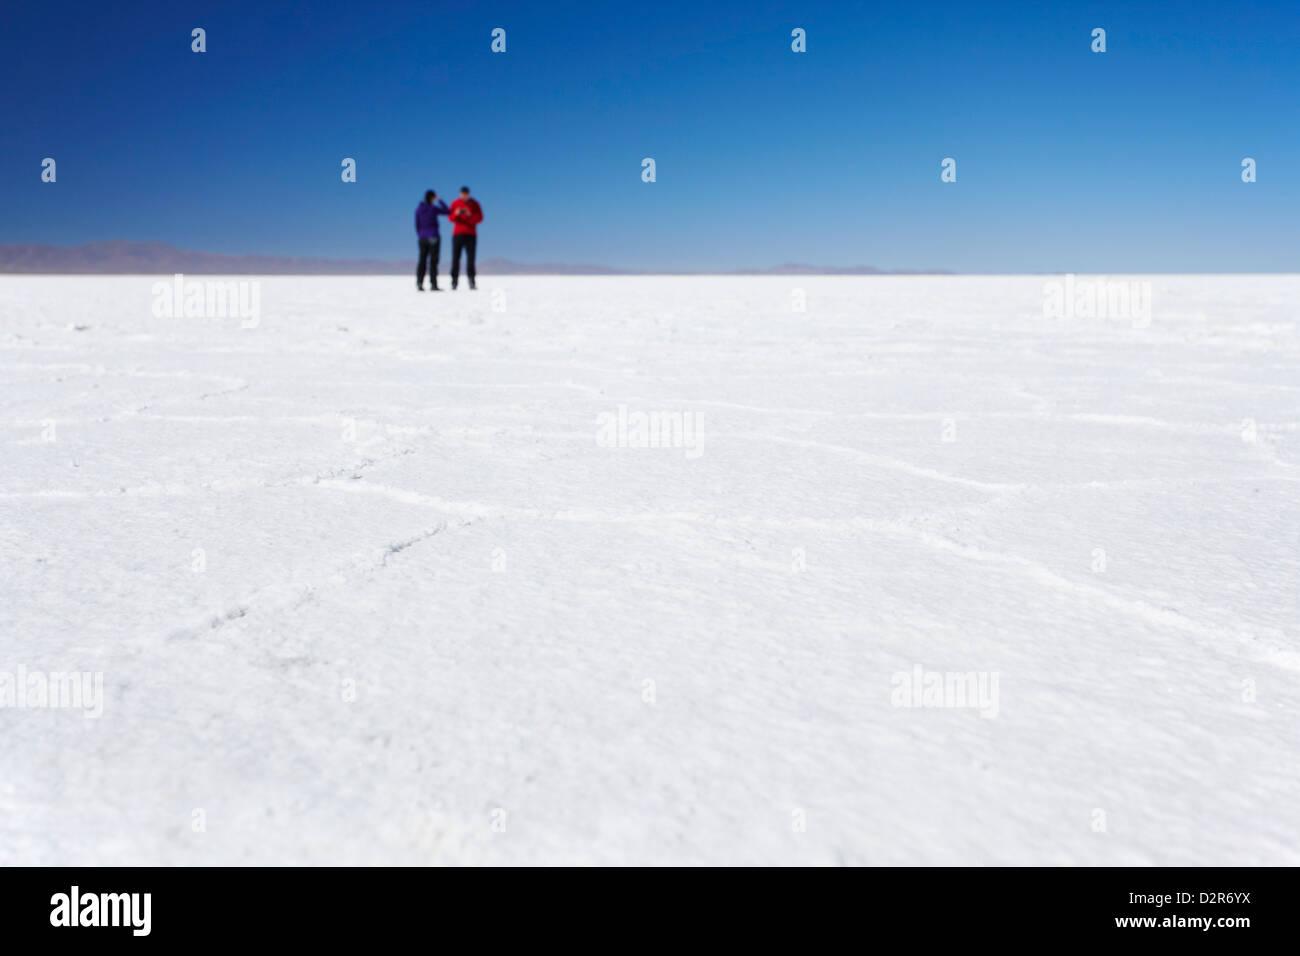 Paar Fotos am Salar de Uyuni (Salt Flats von Uyuni), Abteilung Potosi, Bolivien, Südamerika Stockbild